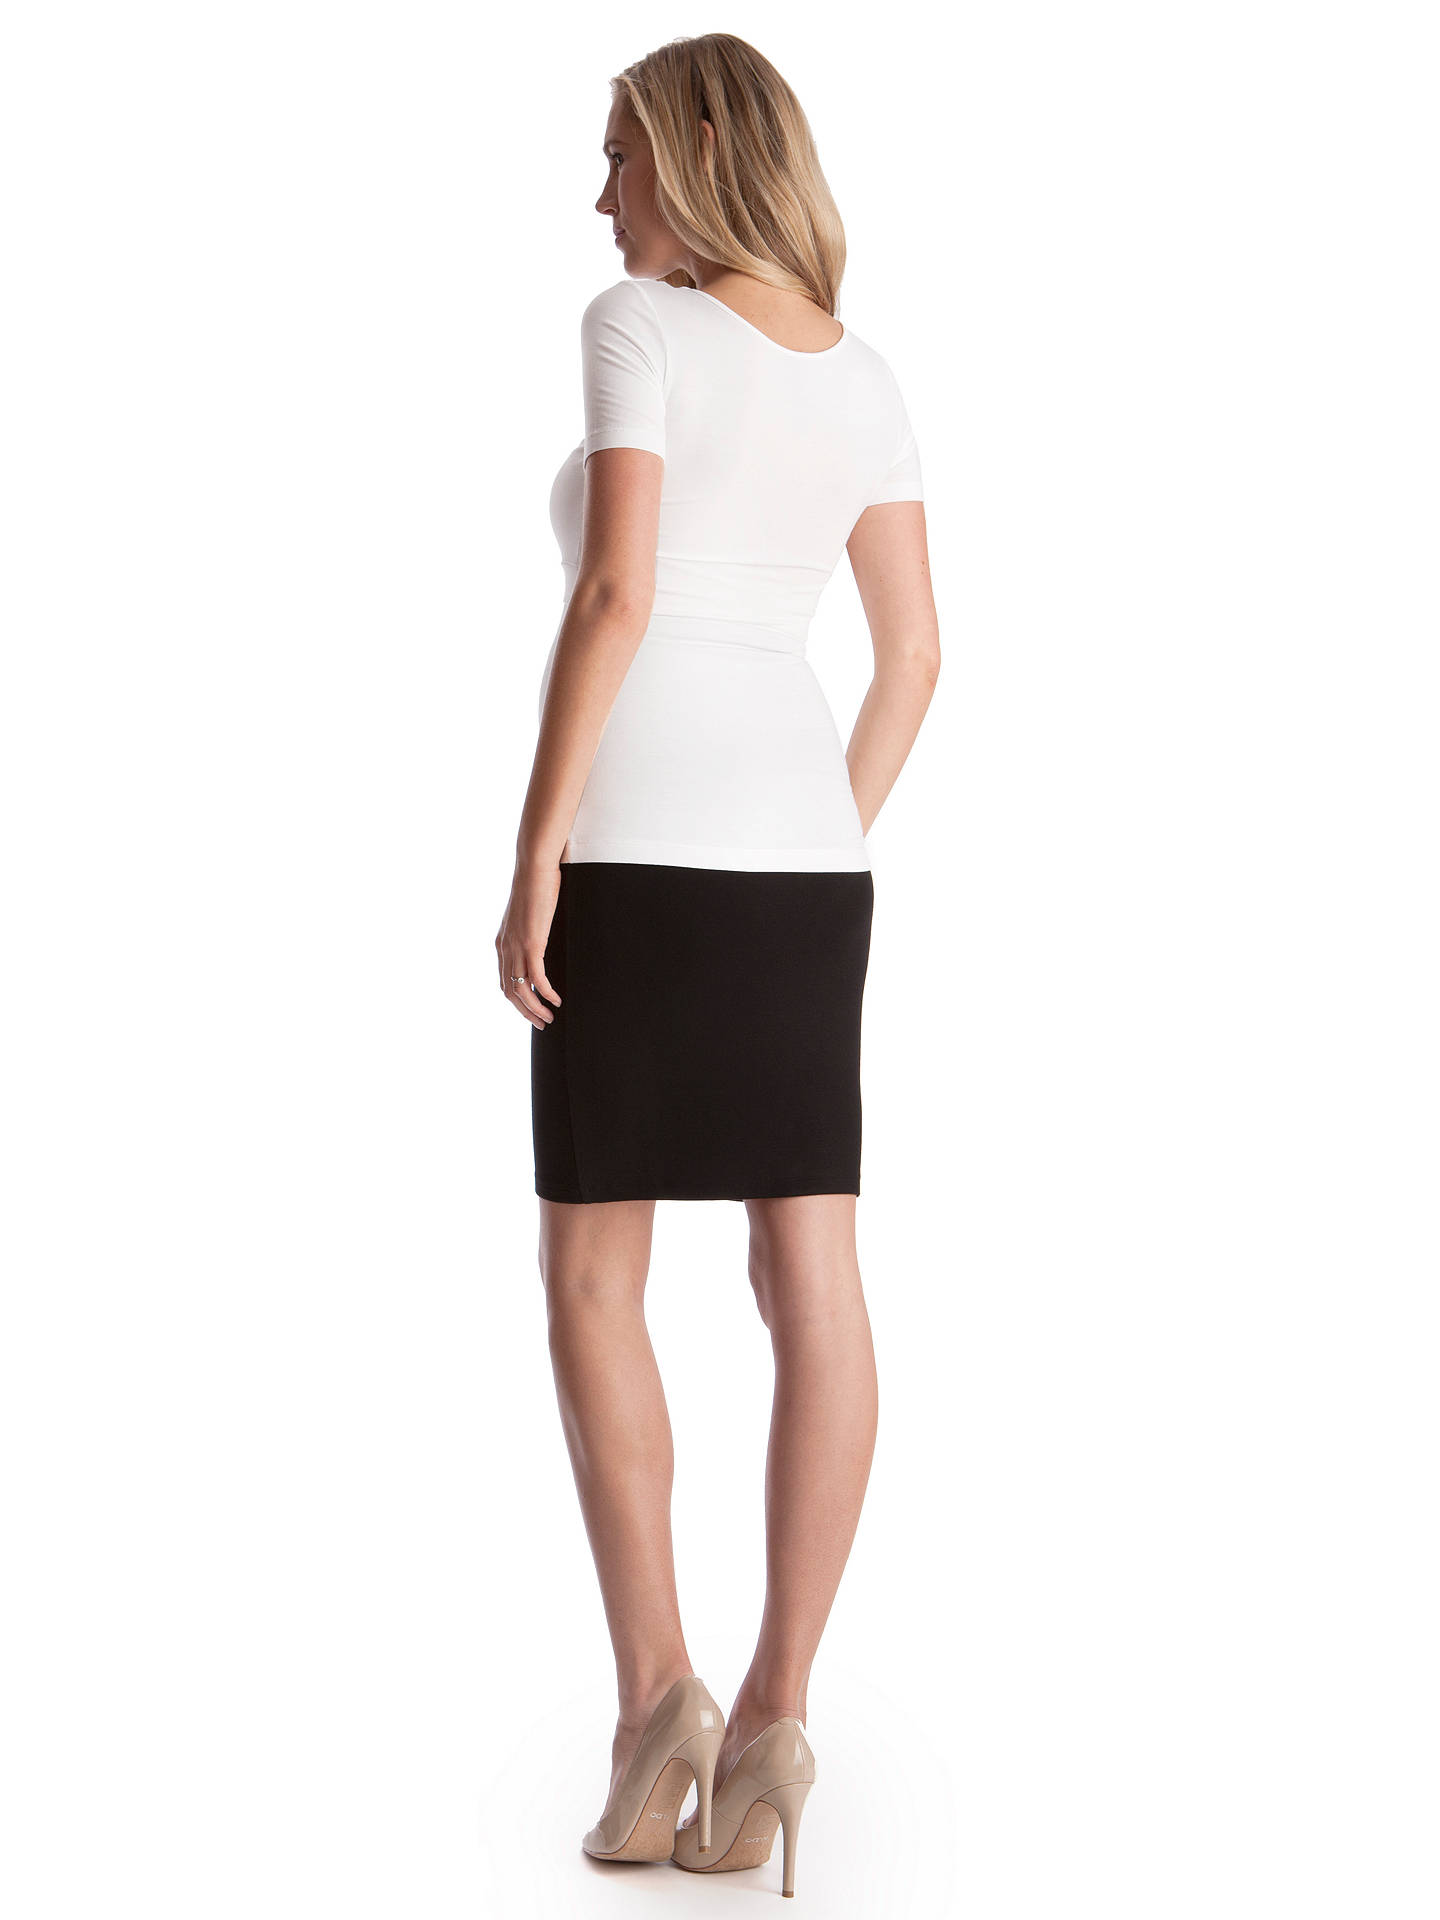 e05f3e3210cd1 ... Buy Séraphine Cathy Bodycon Maternity Pencil Skirt, Black, S Online at  johnlewis.com ...